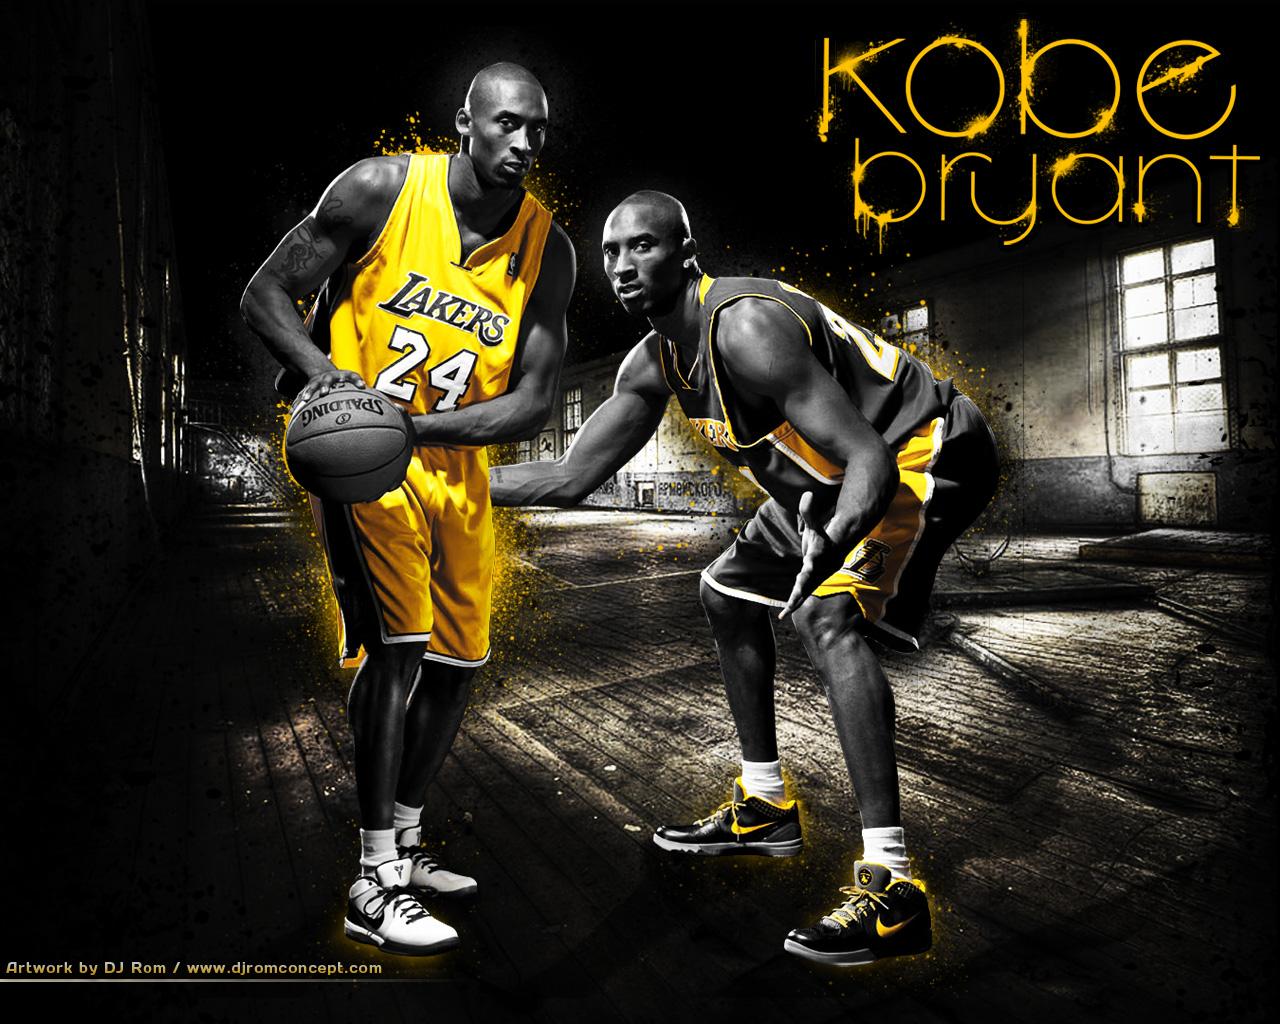 Best Kobe Bryant Wallpapers: Name Of Sport